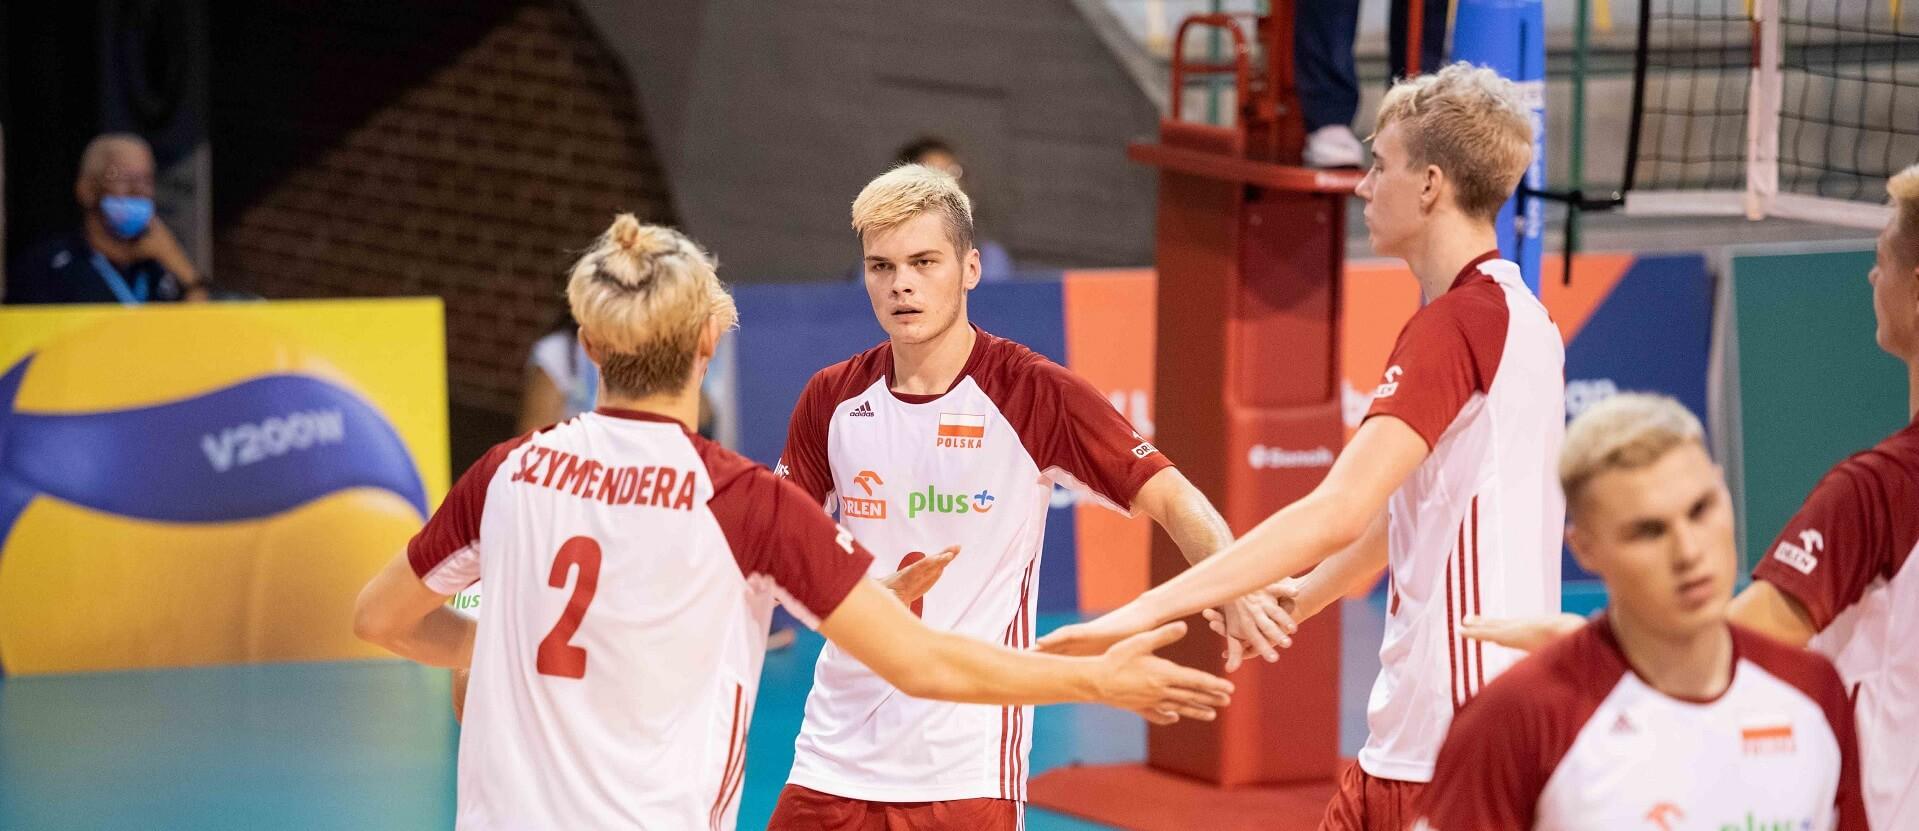 ME U18: Polska - Bułgaria 3:1 - Polacy z brązowymi medalami!